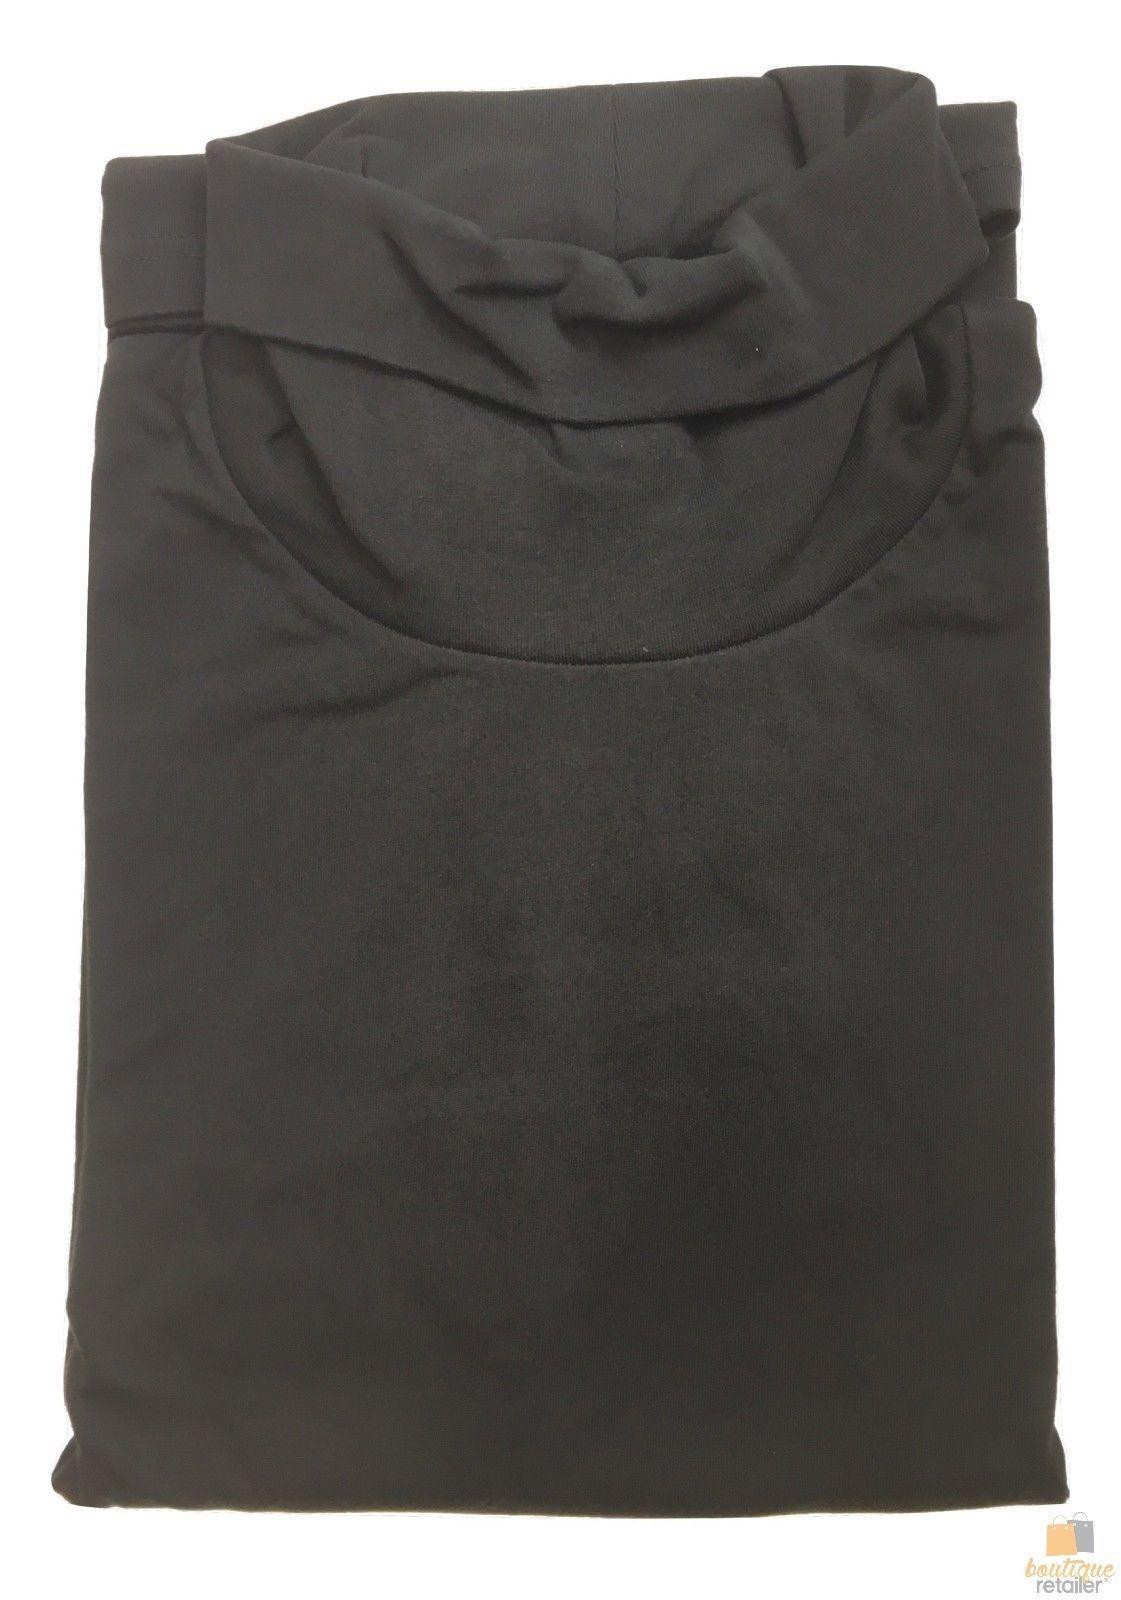 Men's SKIVVY Long Sleeve Plain Top Skivvies Warm High Neck Cotton Blend New 0750